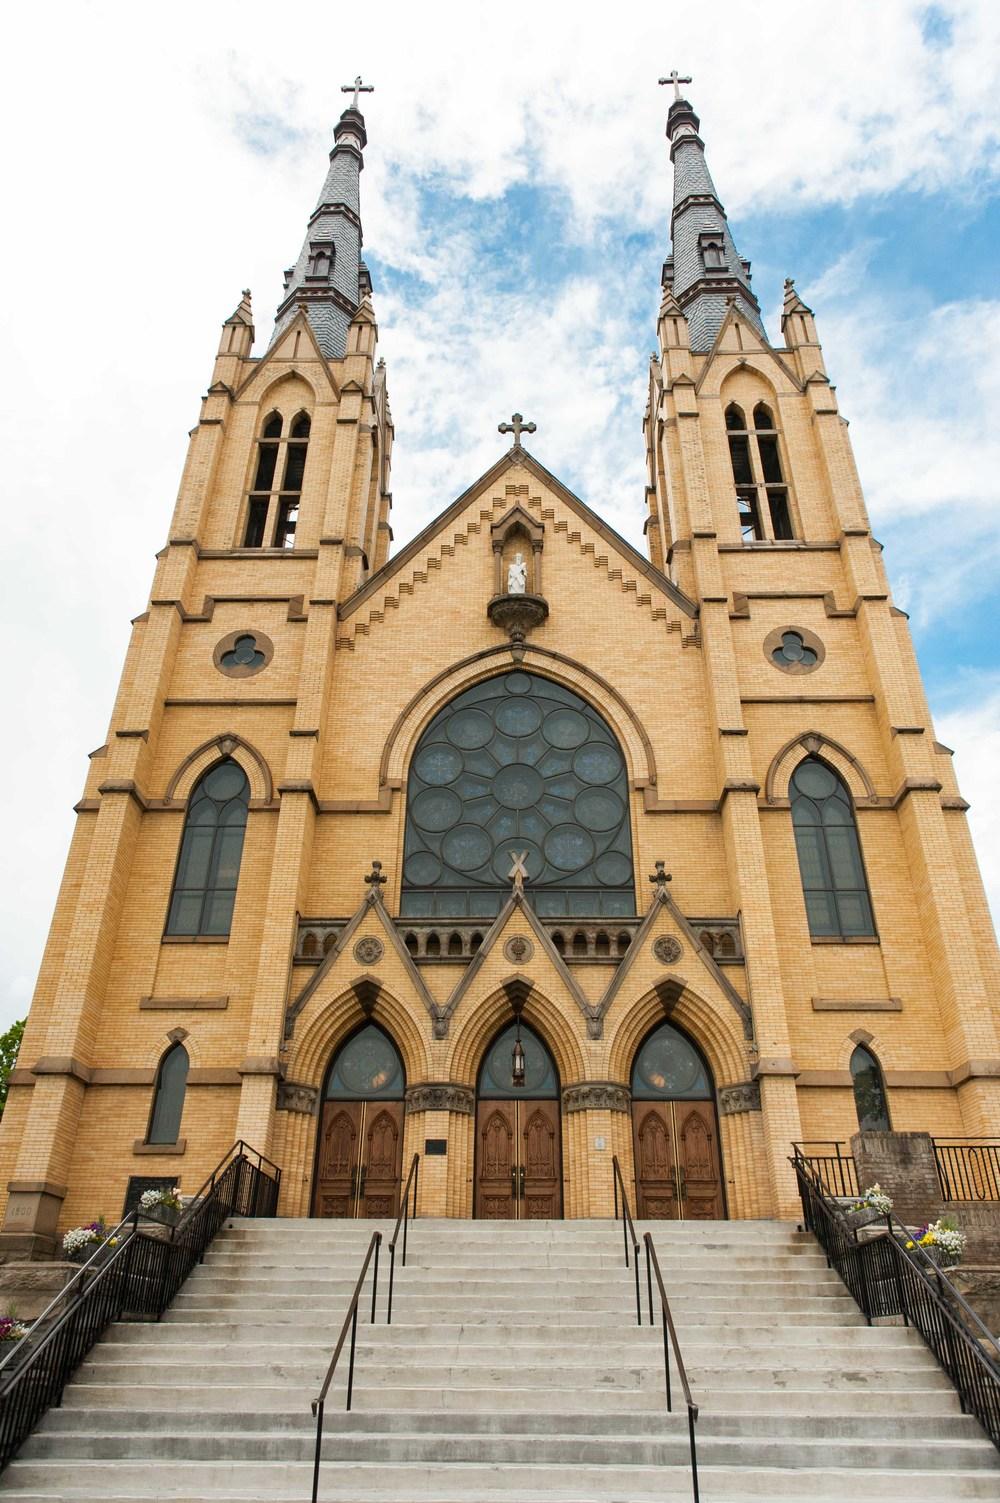 St. Andrew's Roanoke